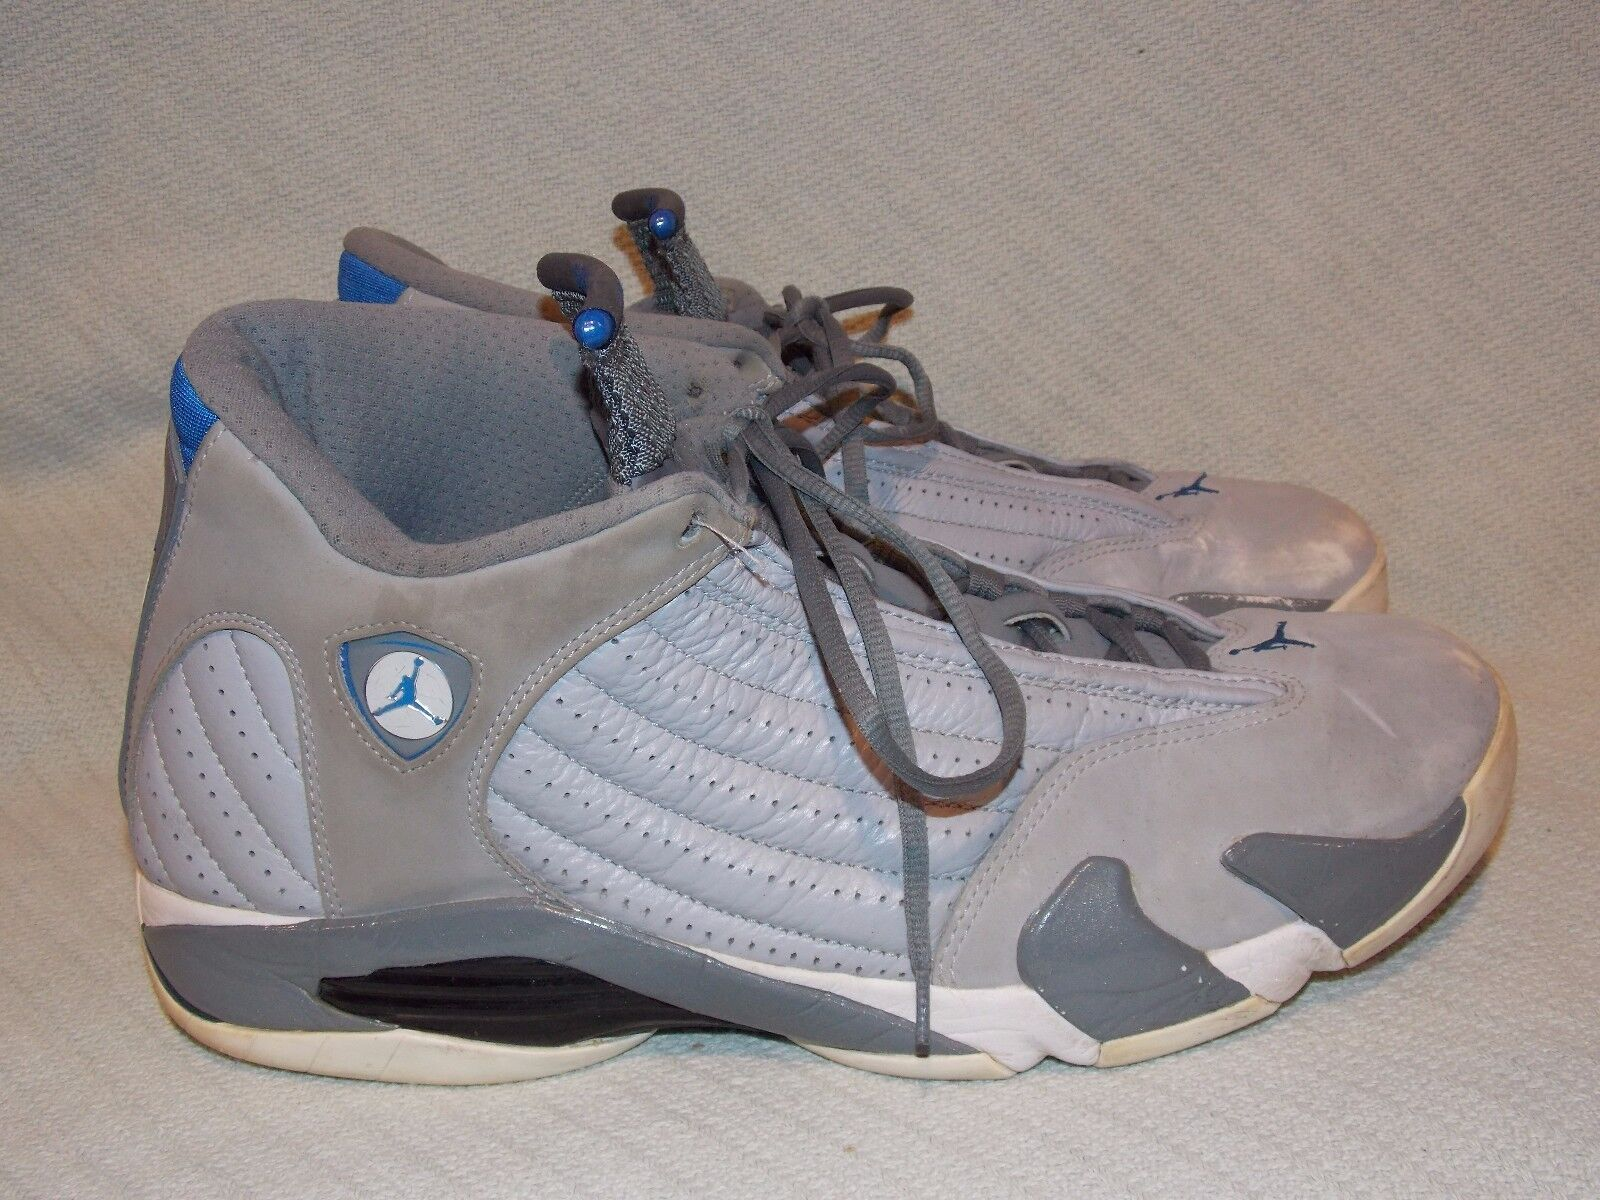 nike air jordan 14 retro - blaue wolf grau / sport blaue - kühle grau - weiß 487471-004 größe. ae429d